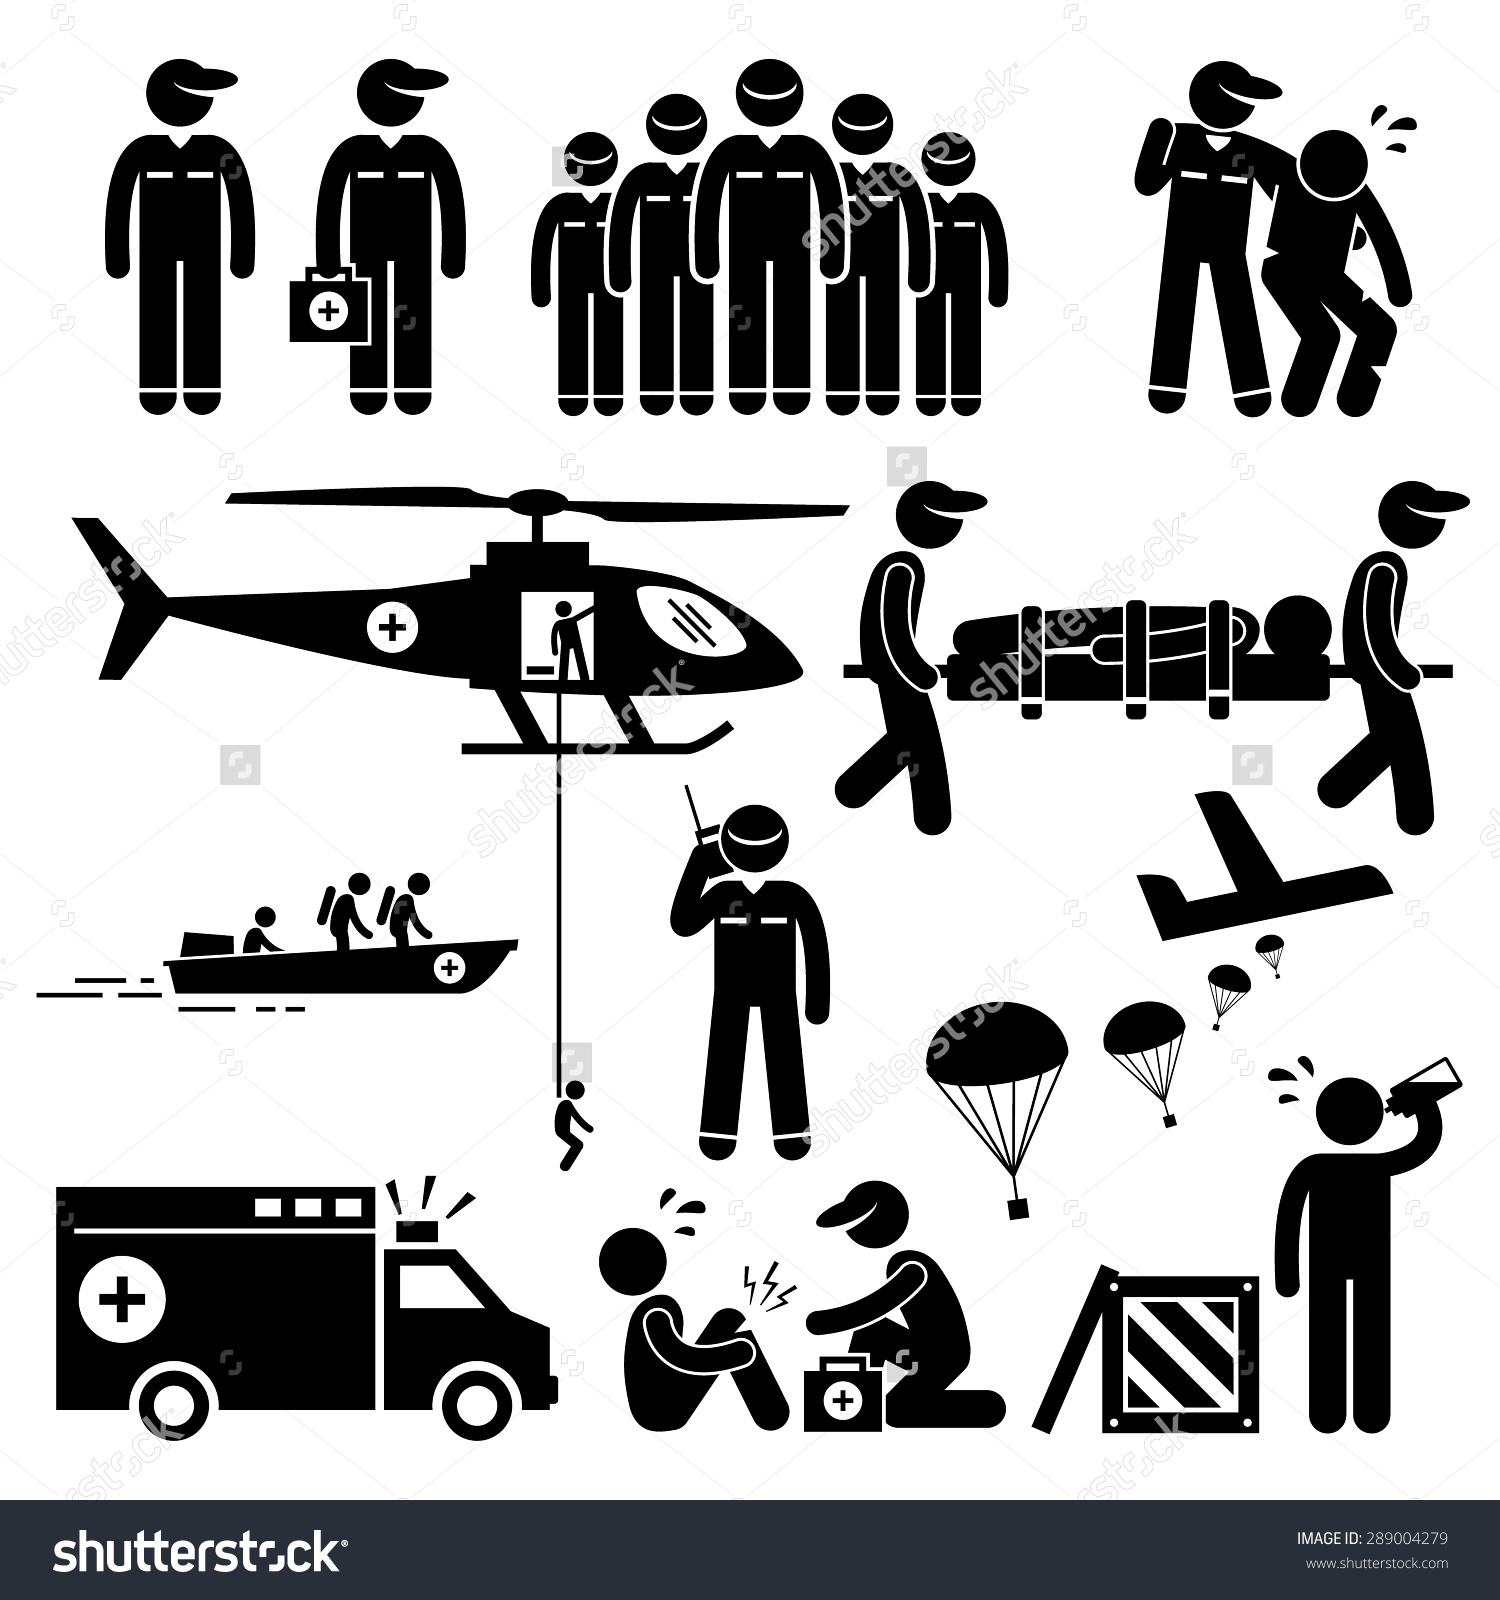 Emergency Rescue Team Stick Figure Pictogram Stock Illustration.